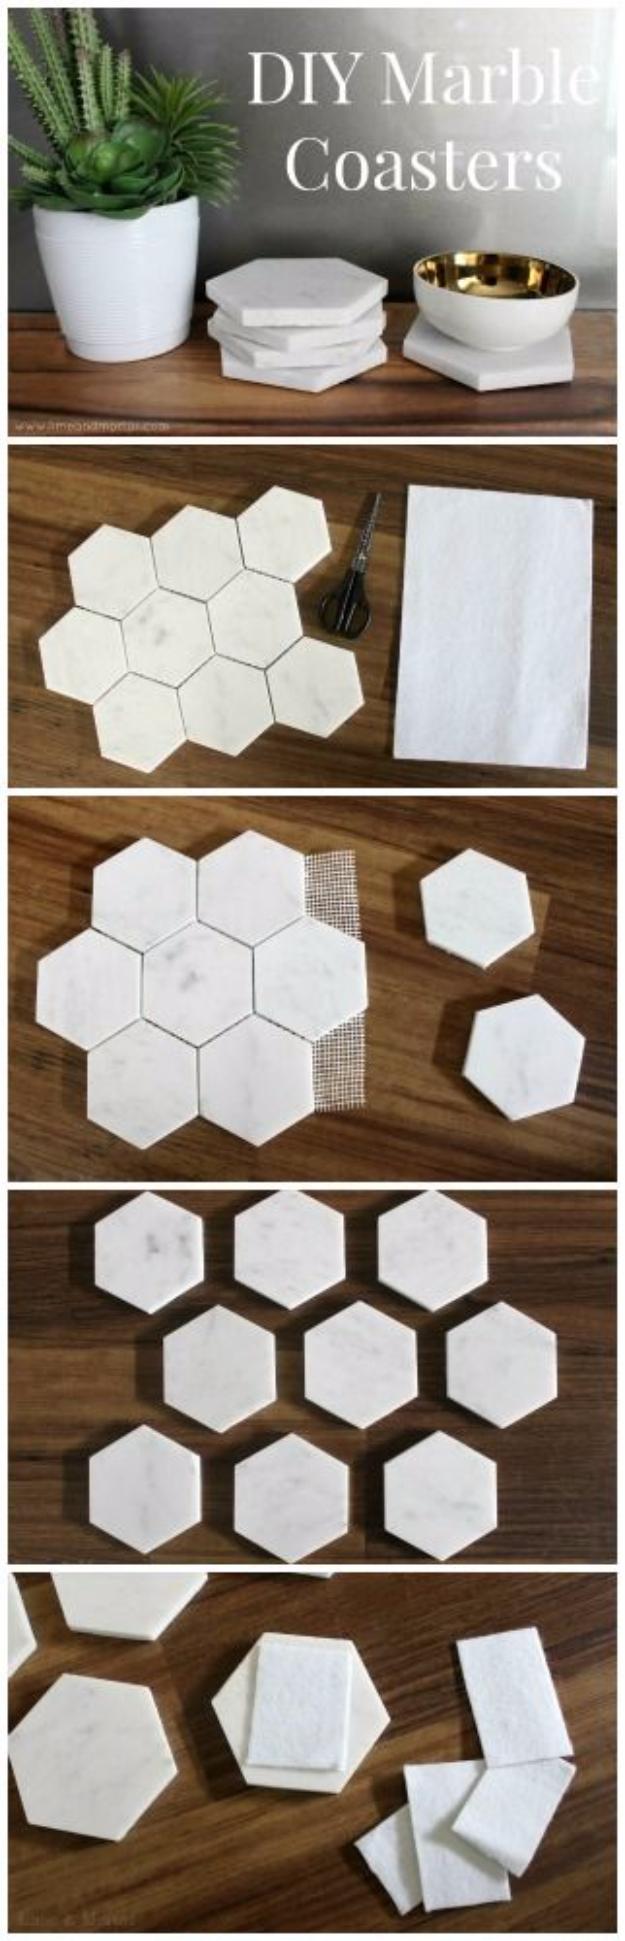 33 Diy Ideas For Handmade Coasters